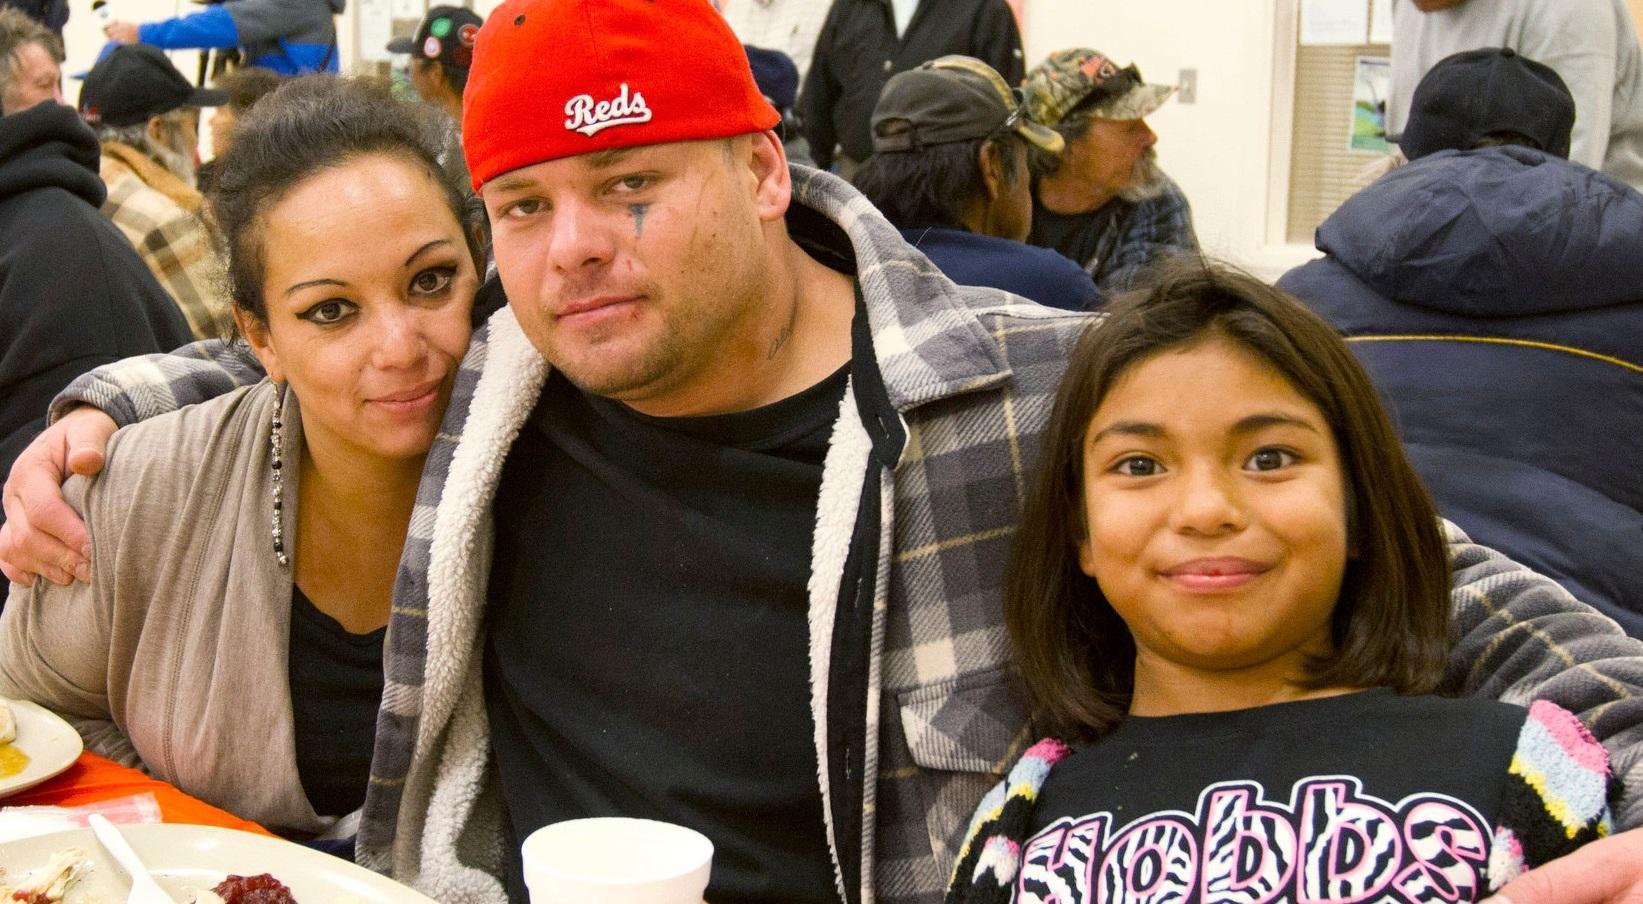 Guests, Steelbridge Homeless Outreach Event